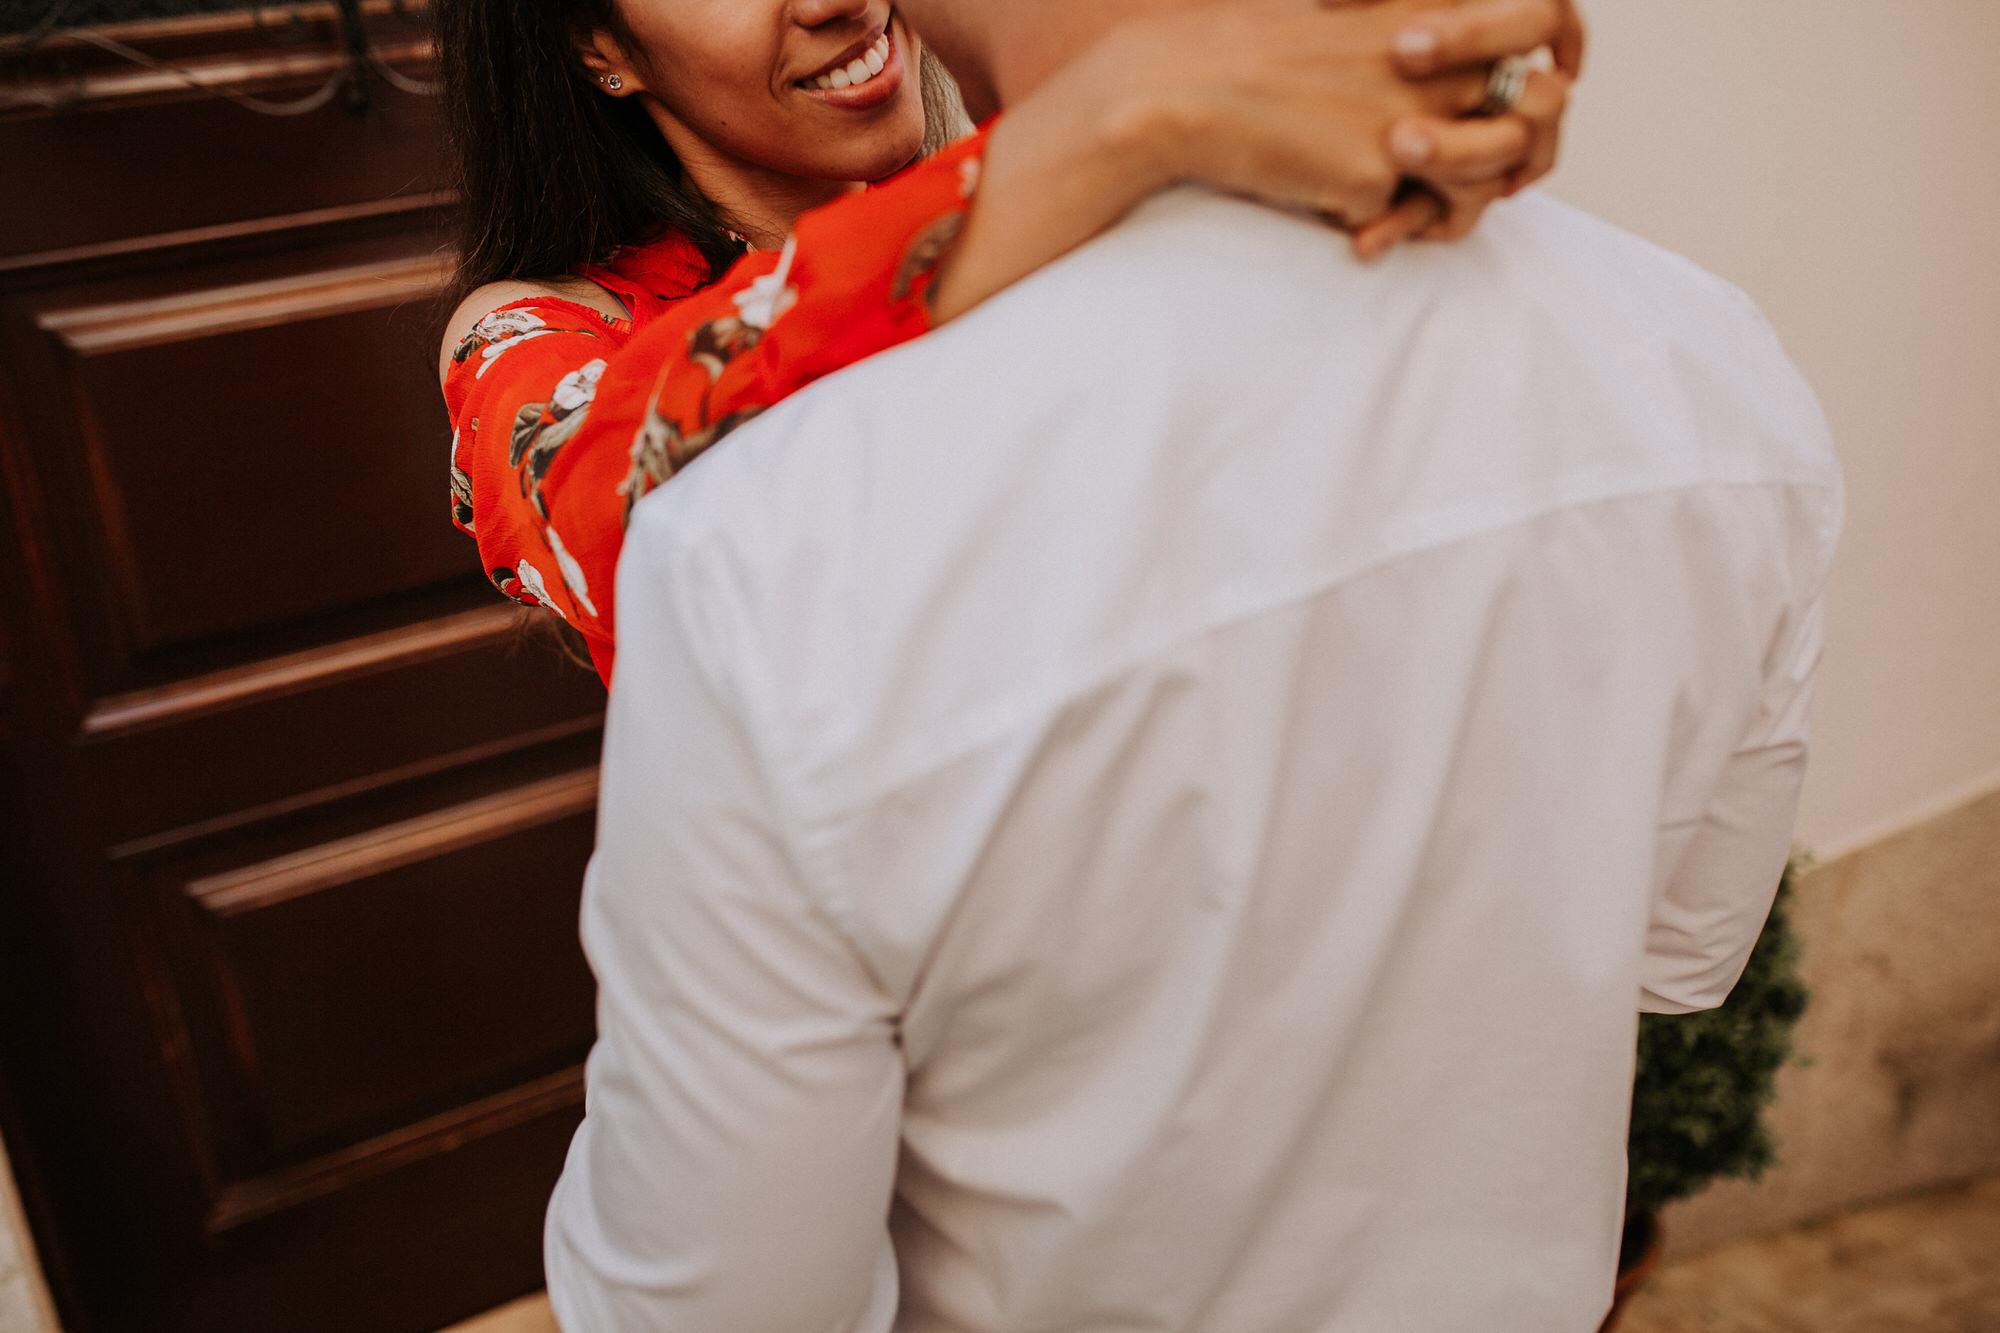 15-sessao-noivado-engagement-love-session-Sintra-lisboa-town-wedding-photography-photographer-natural-best-venue-planner-destination-filipe-santiago-fotografia-lifestyle-documentary